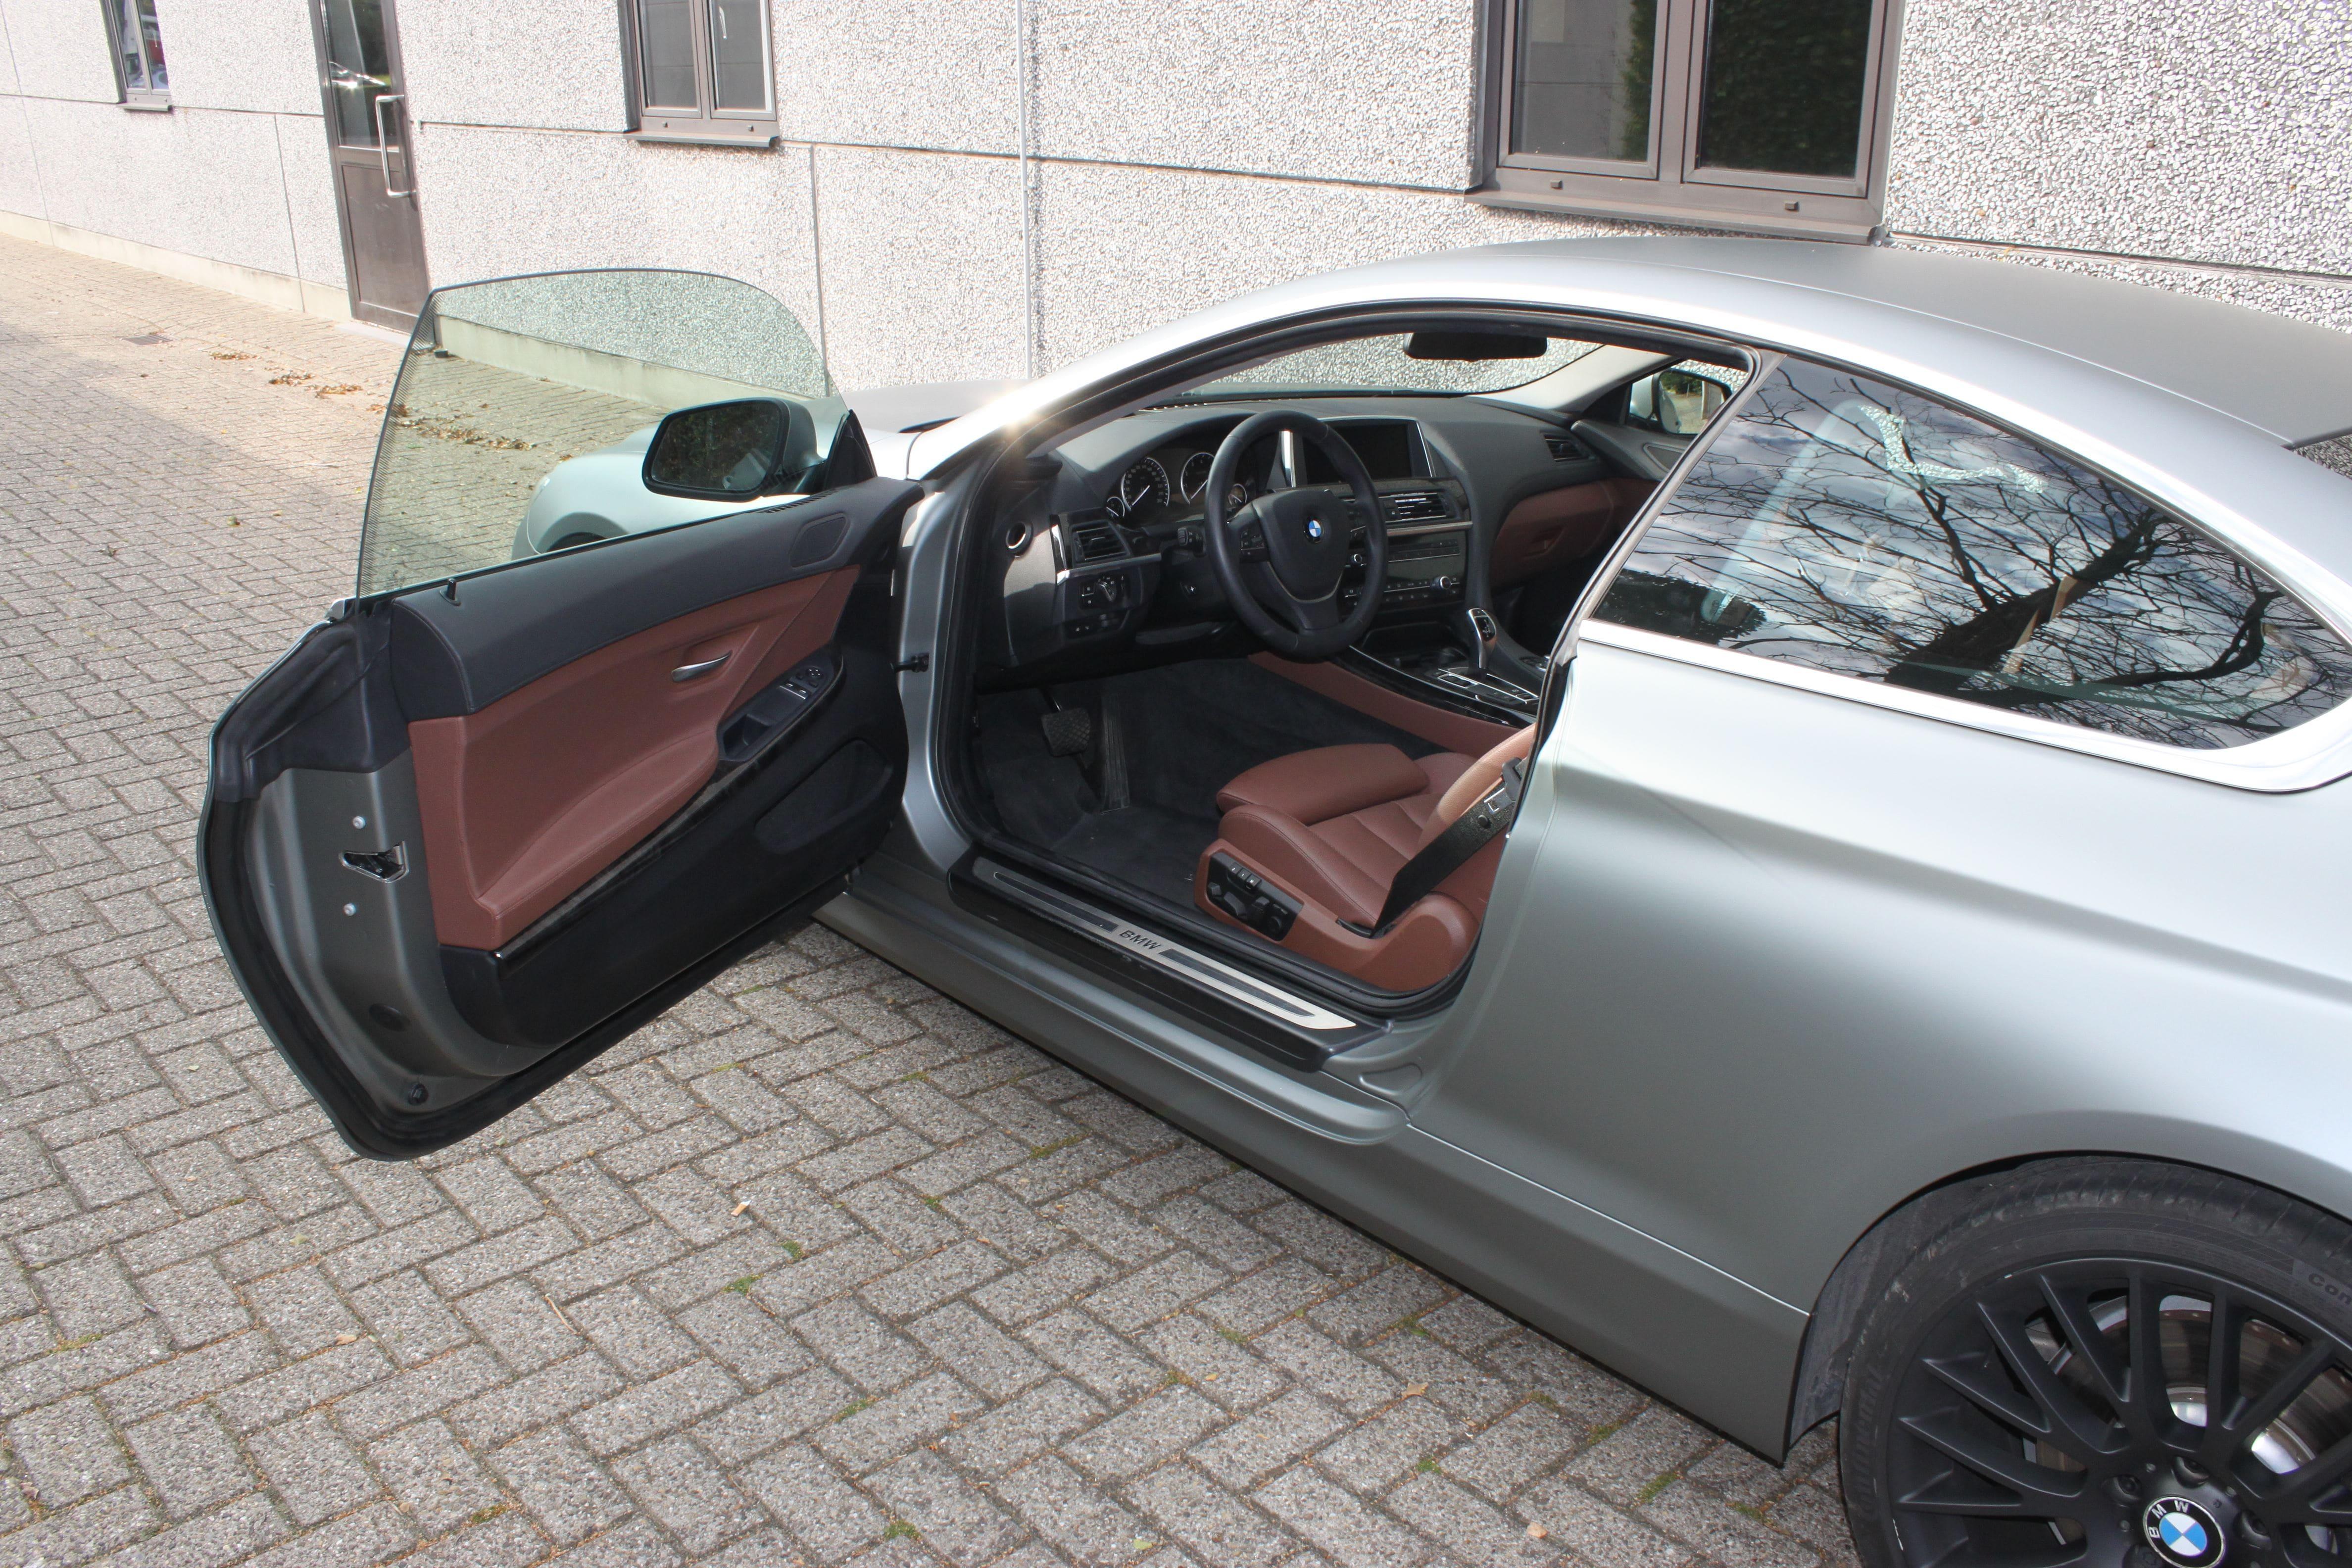 BMW 650i met Mat Antraciet Metallic Avery Wrap, Carwrapping door Wrapmyride.nu Foto-nr:5278, ©2020